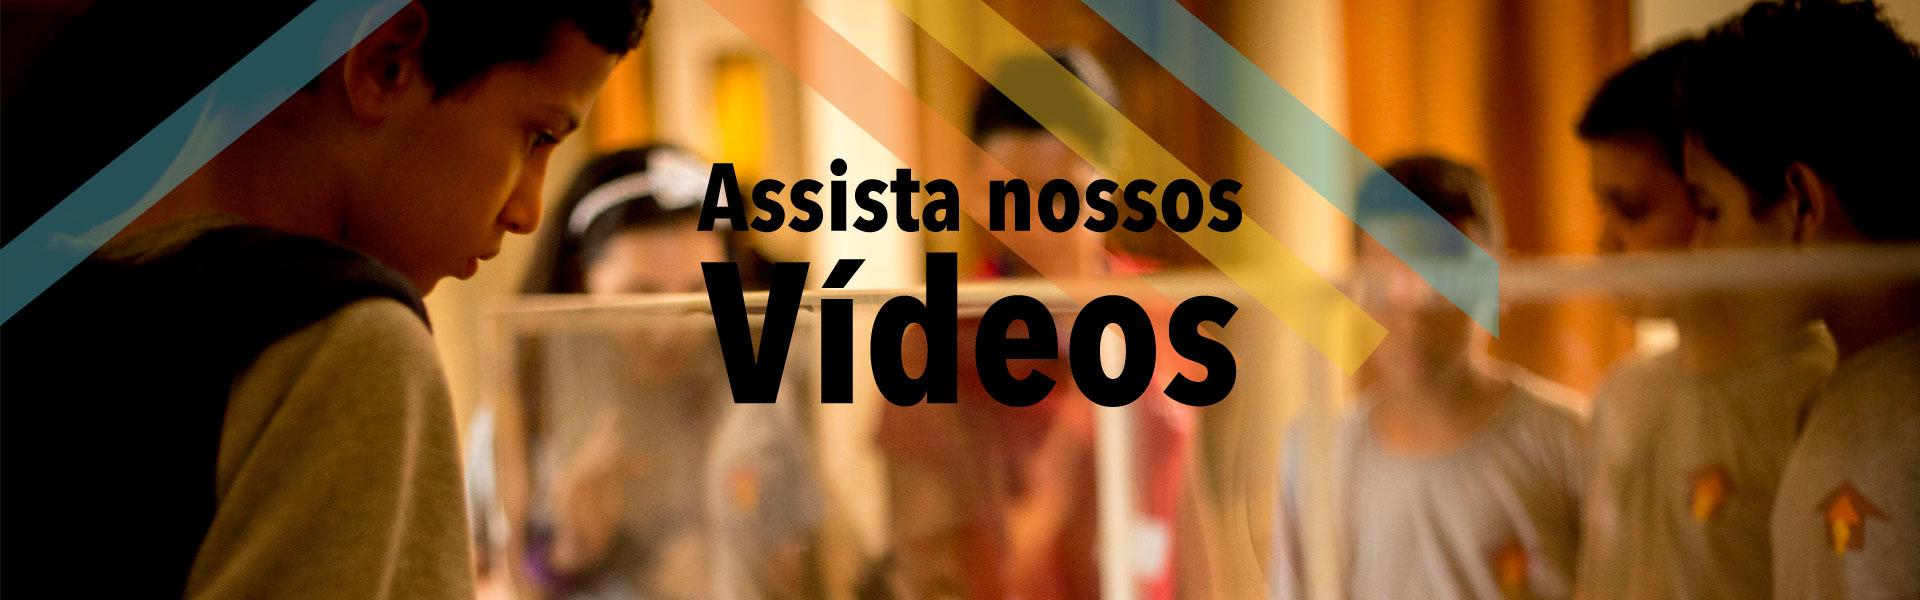 assista-videos